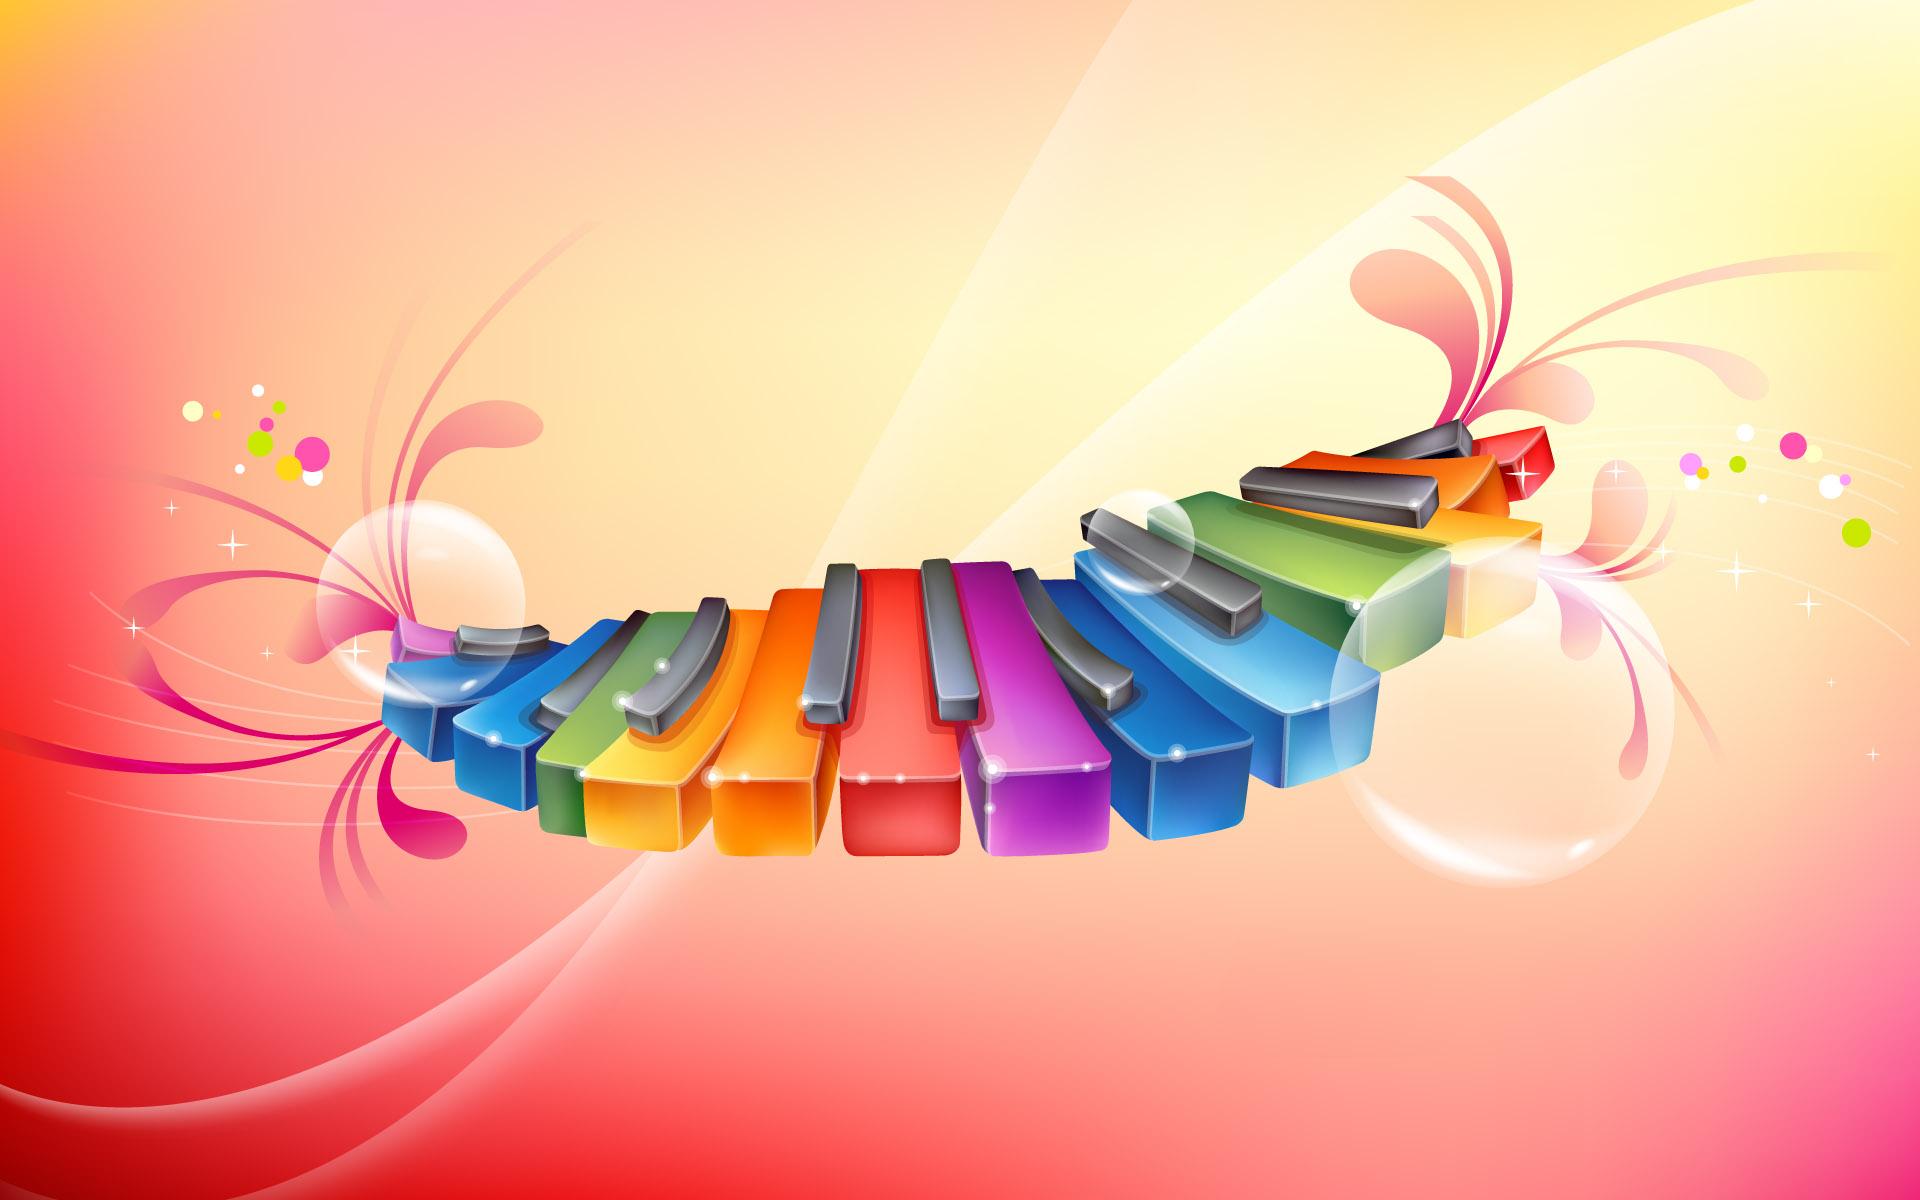 piano wallpaper rhythmic colorful walls wallpapers desktop 1920x1200